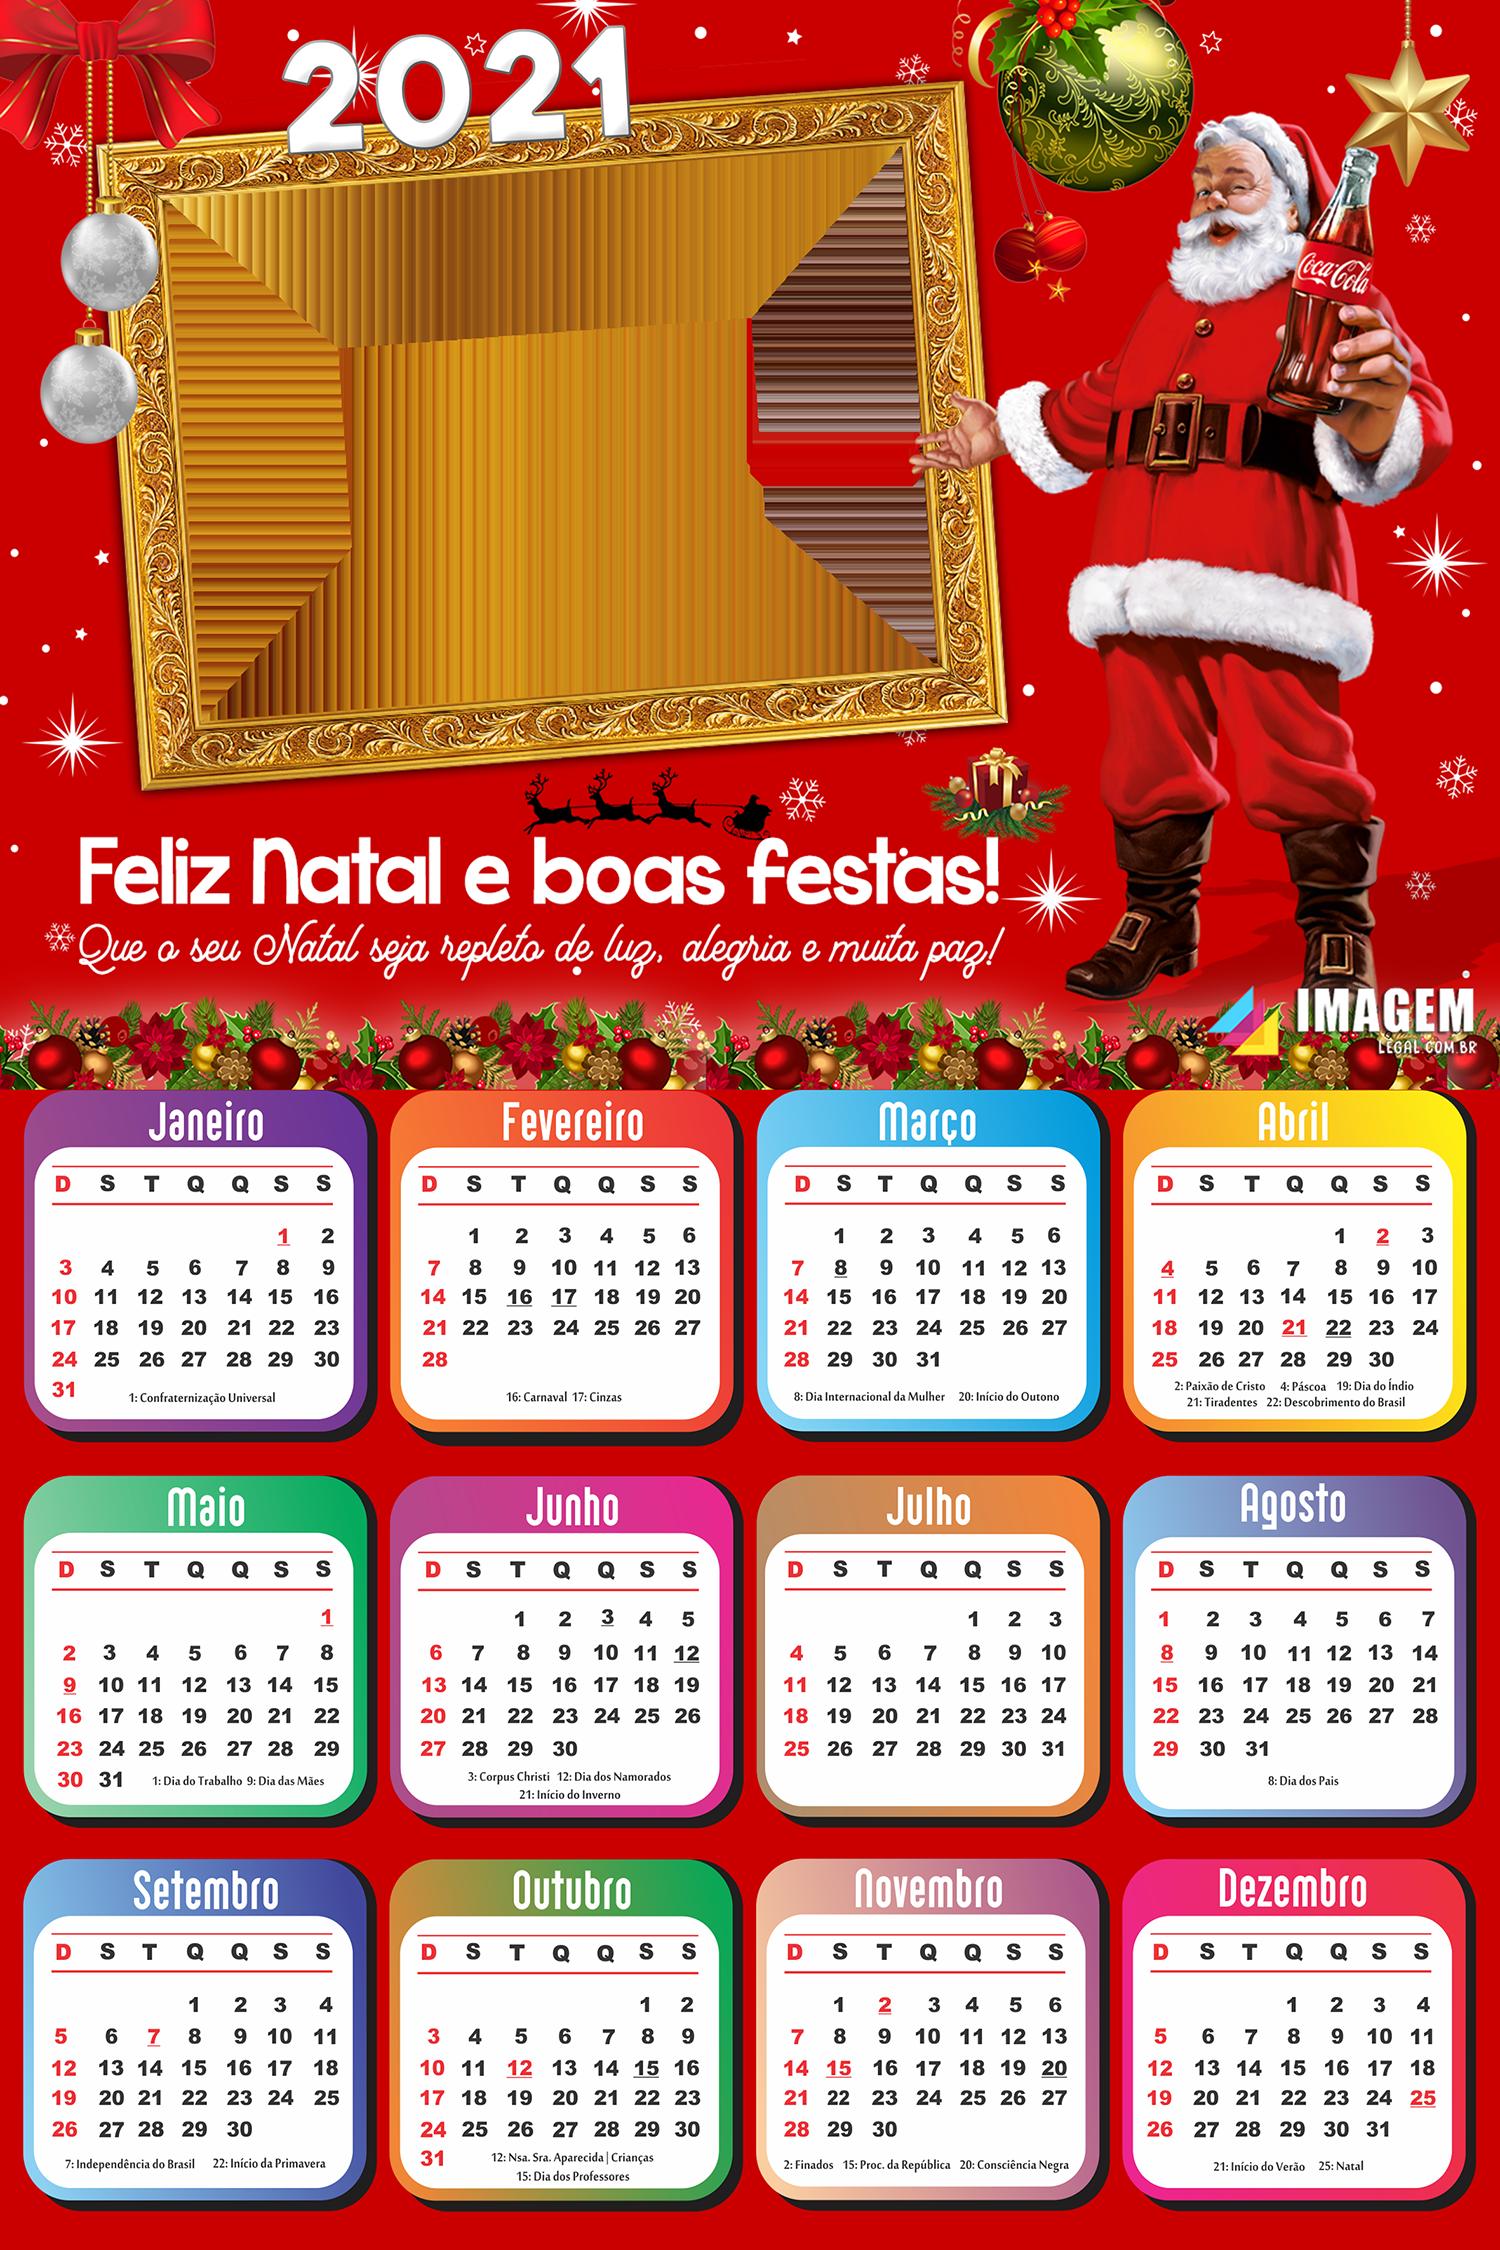 Calendário 2021 Papai Noel Coca Cola